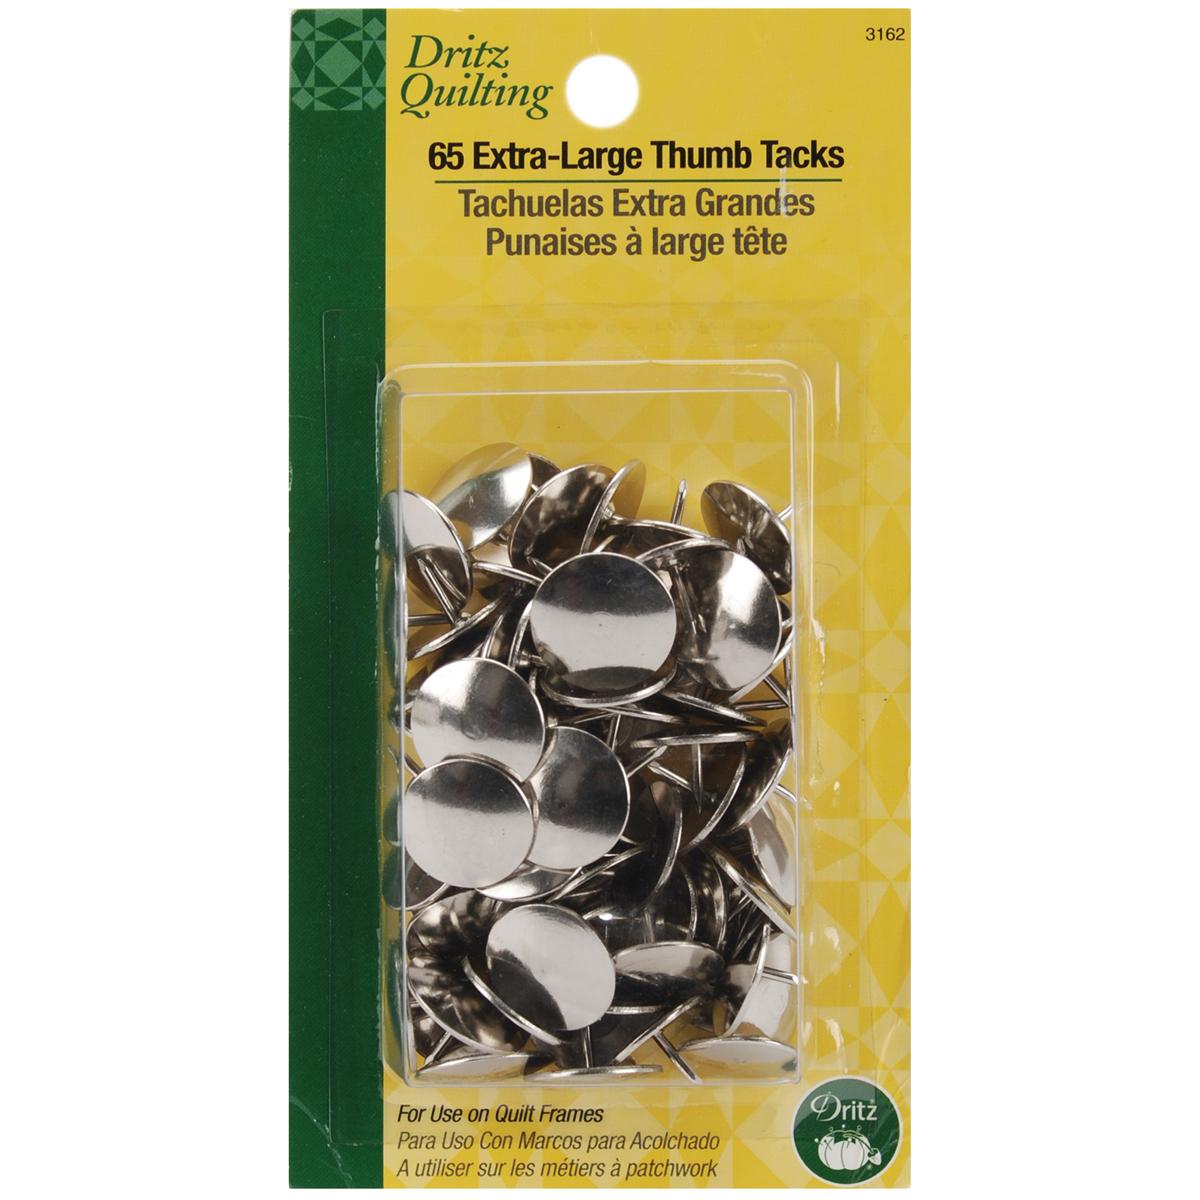 Dritz-Quilting-Extra-Large-Thumb-Tacks-625-034-65-Pkg